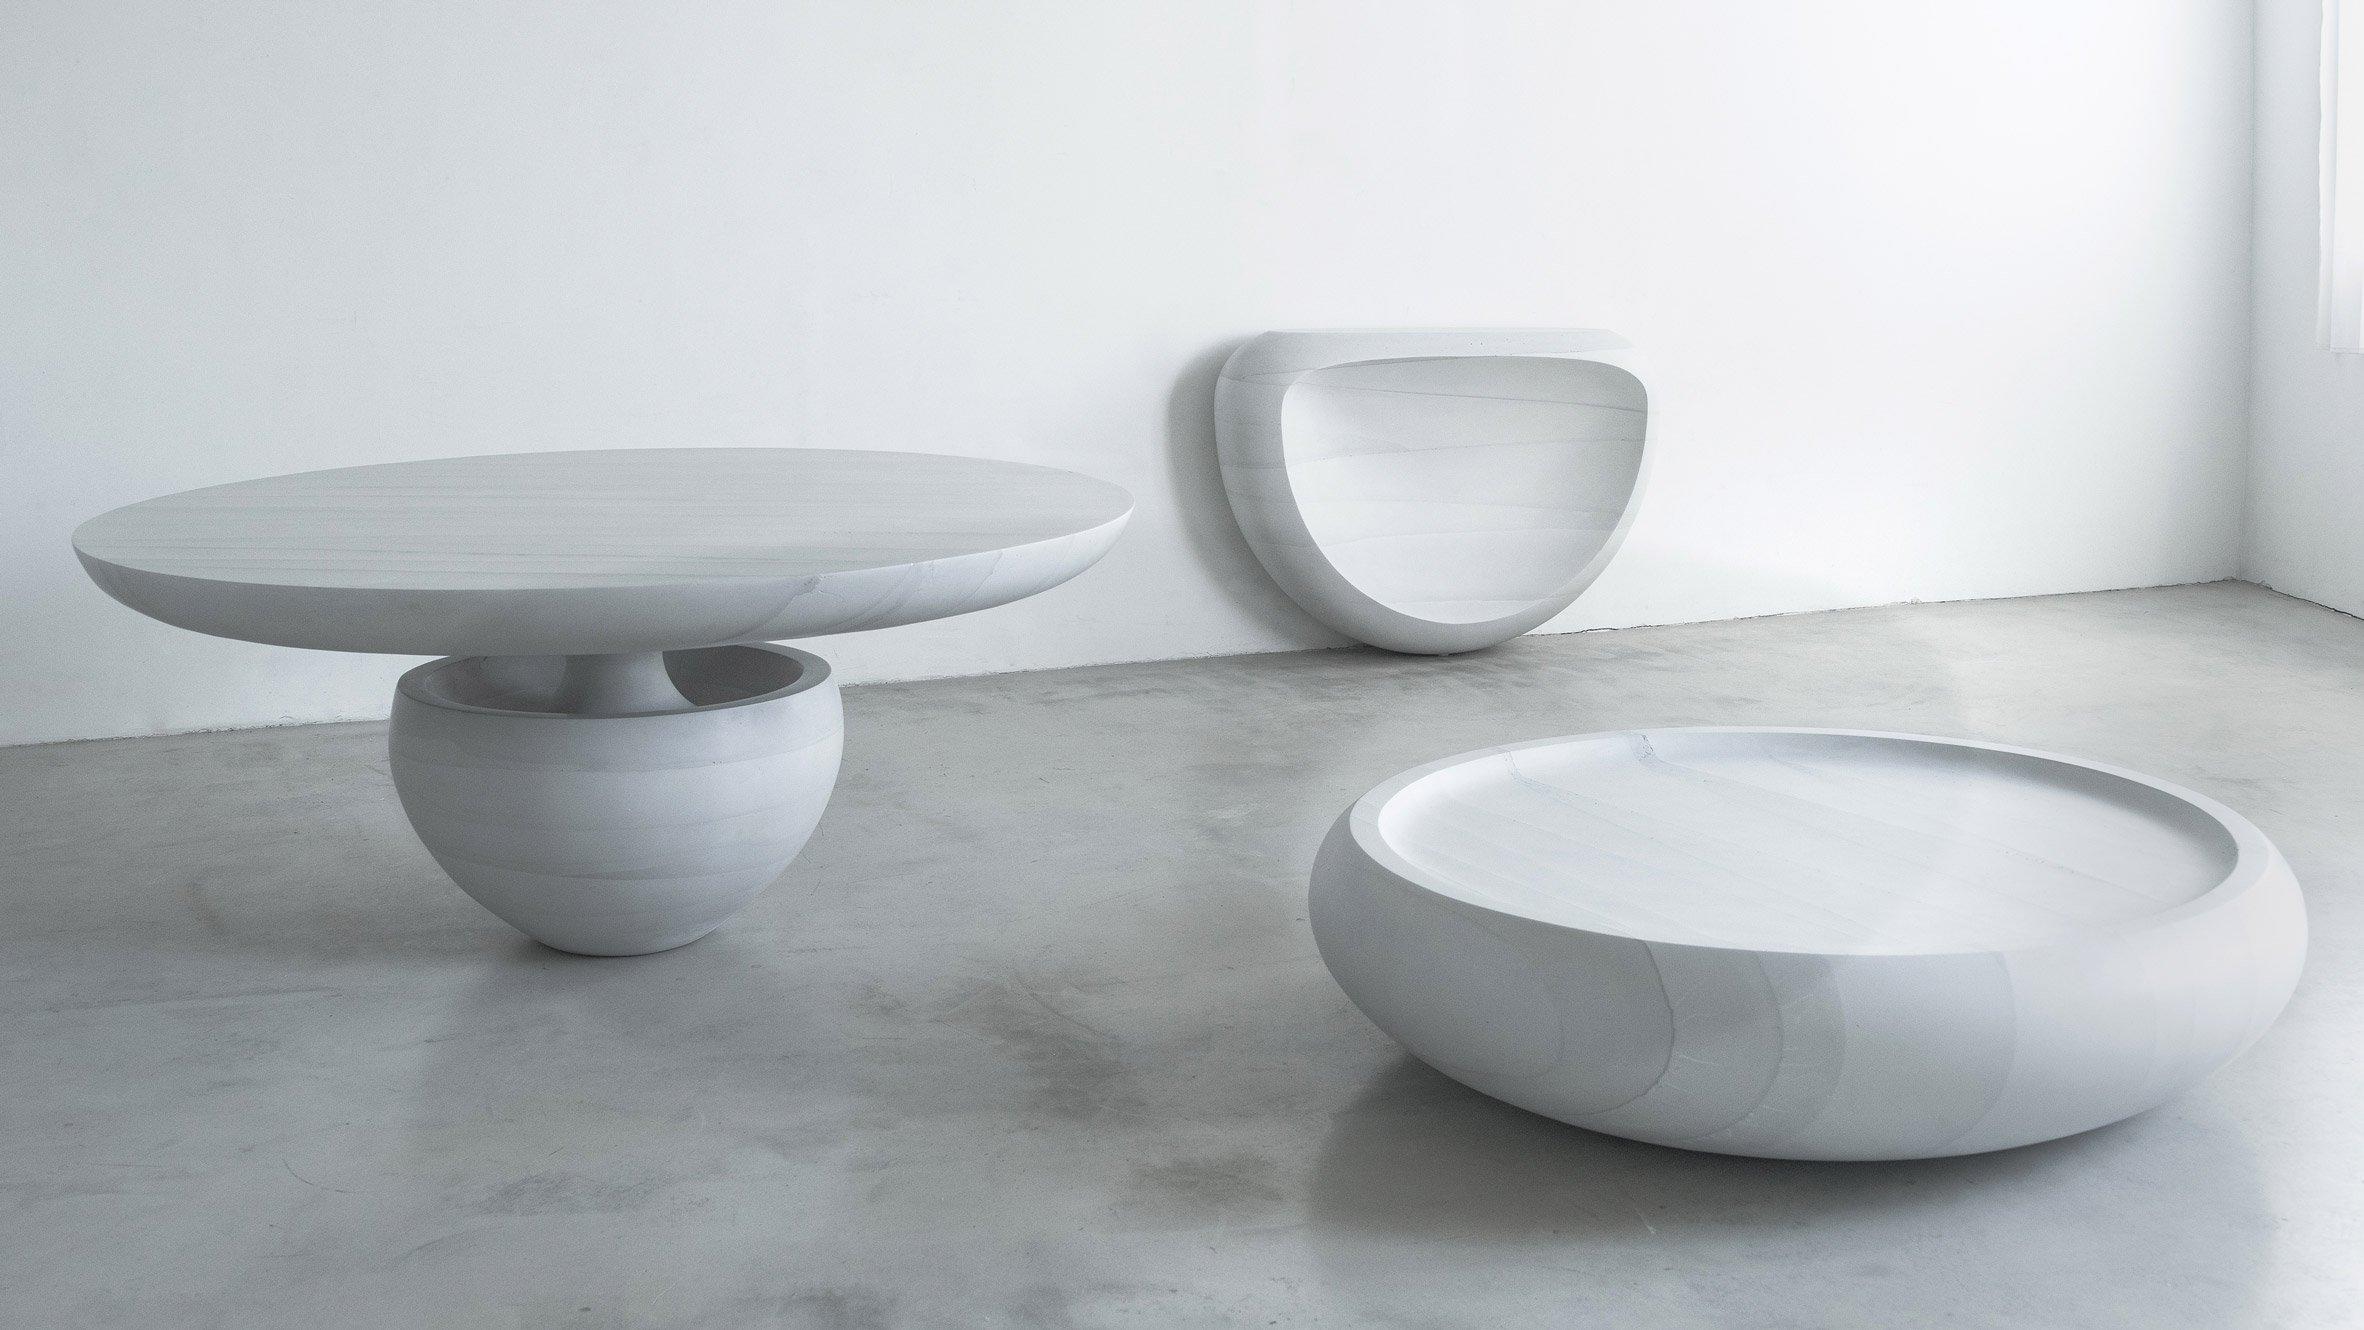 ghost-thaw-furniture-fernando-mastrangelo-collection-new-york-cast_dezeen_hero